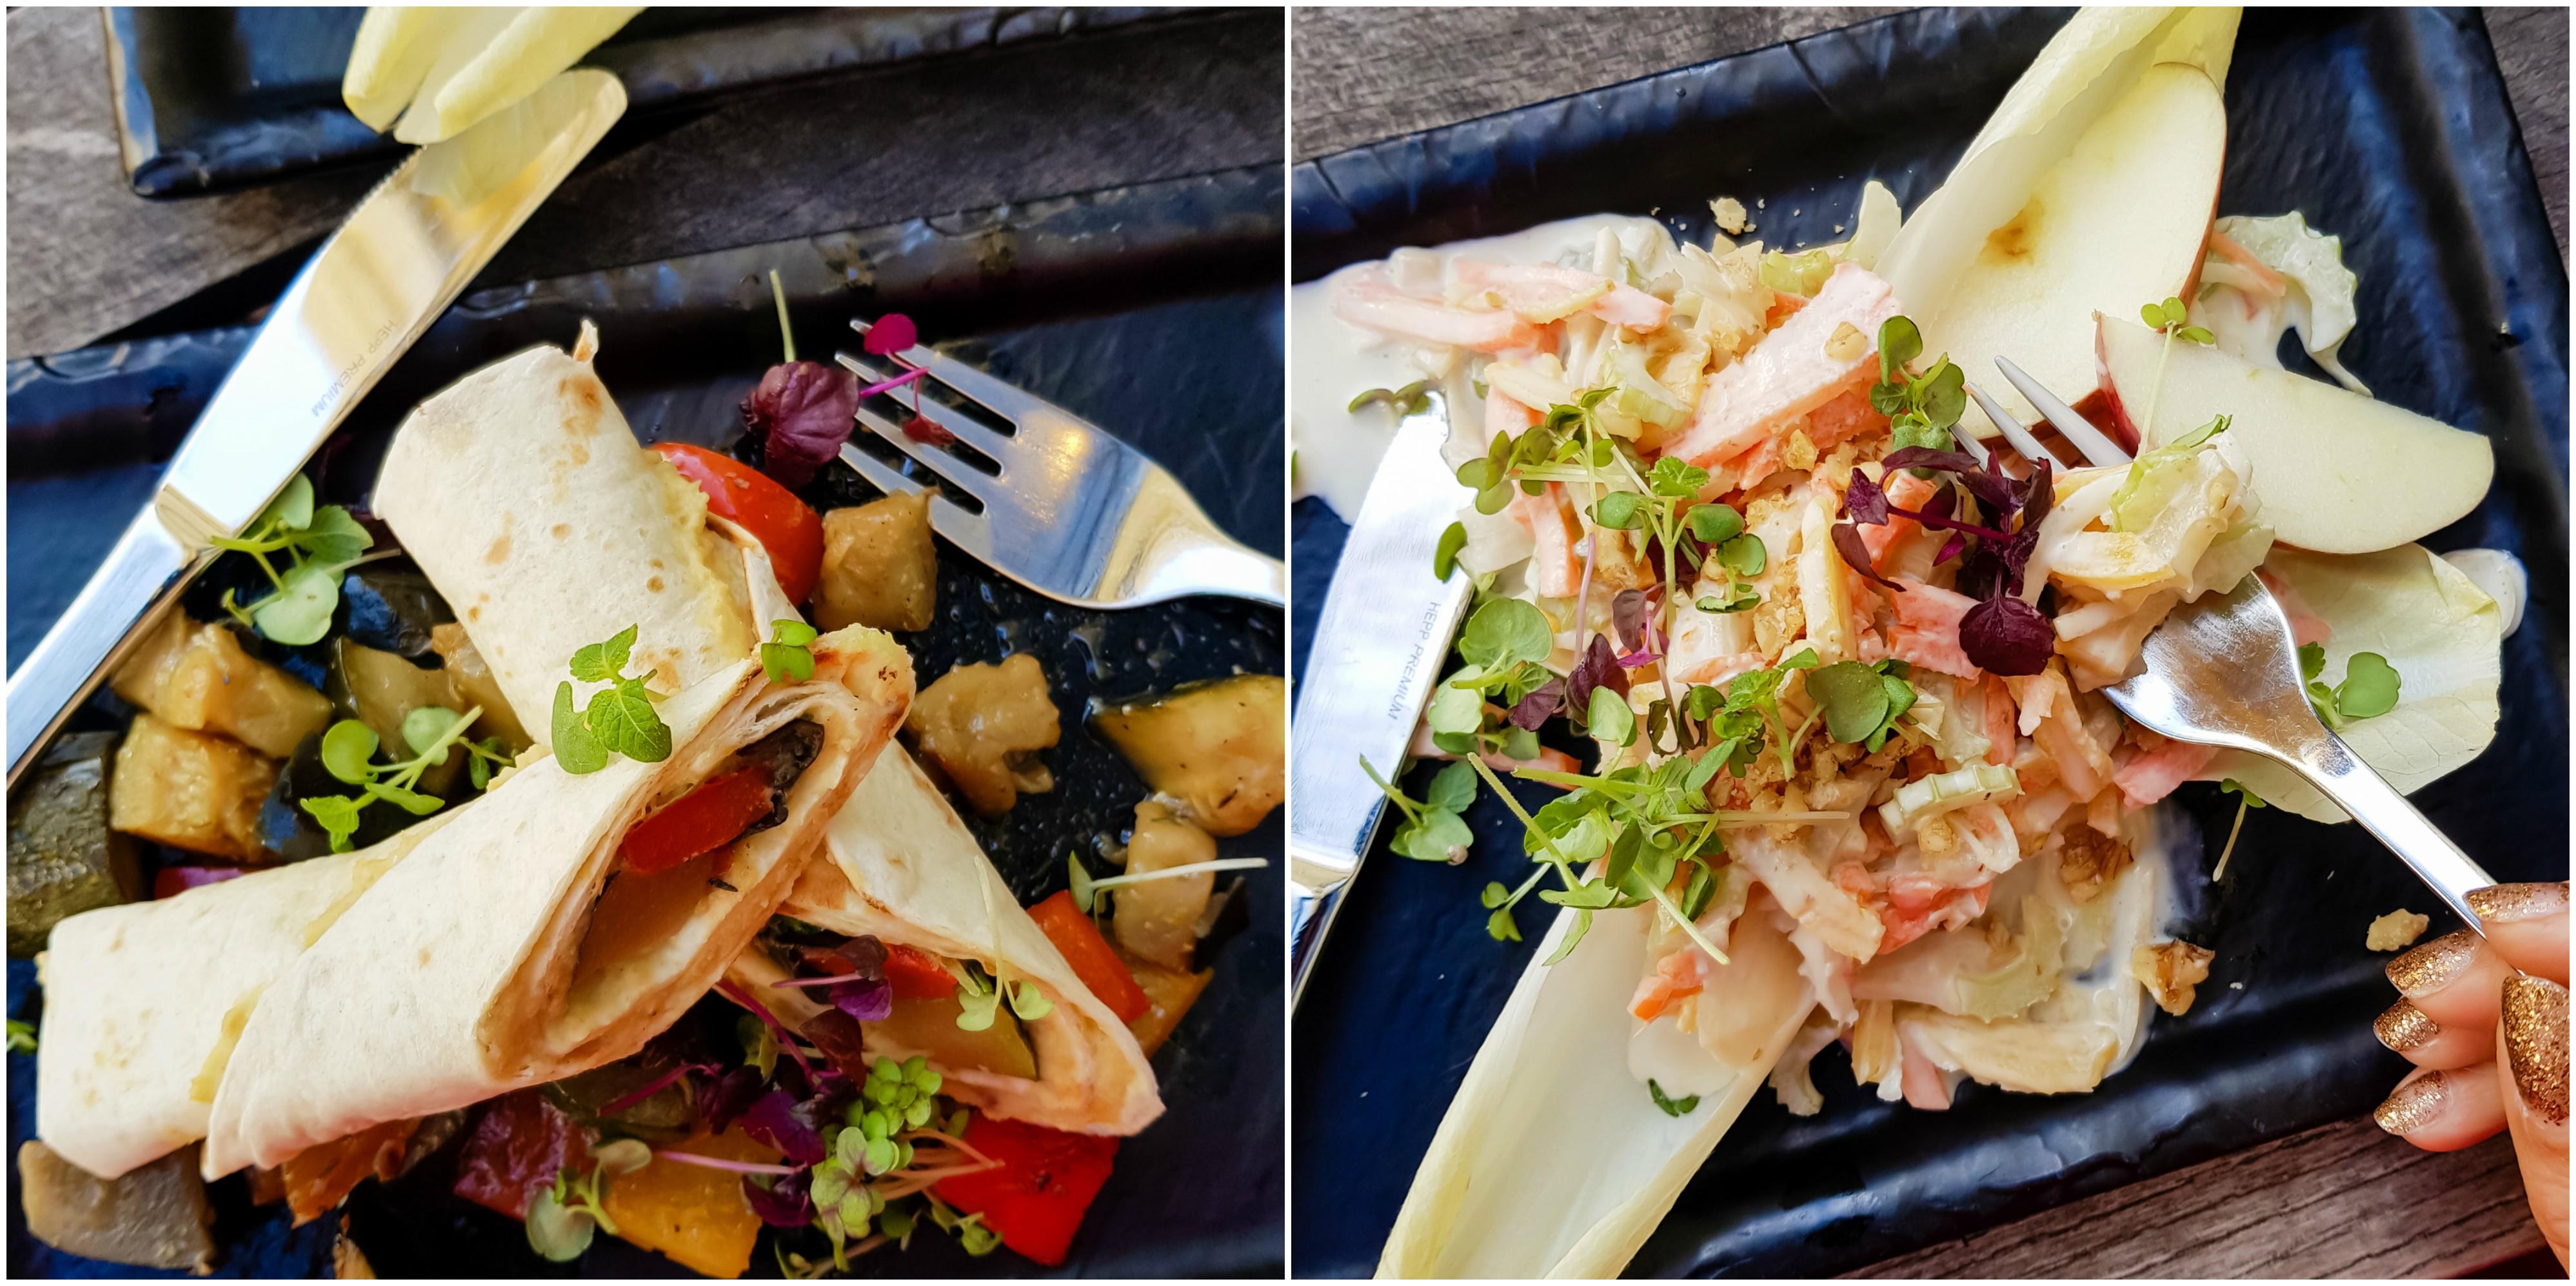 Hollerei-vegan-restaurant-wrap-houmous-salad